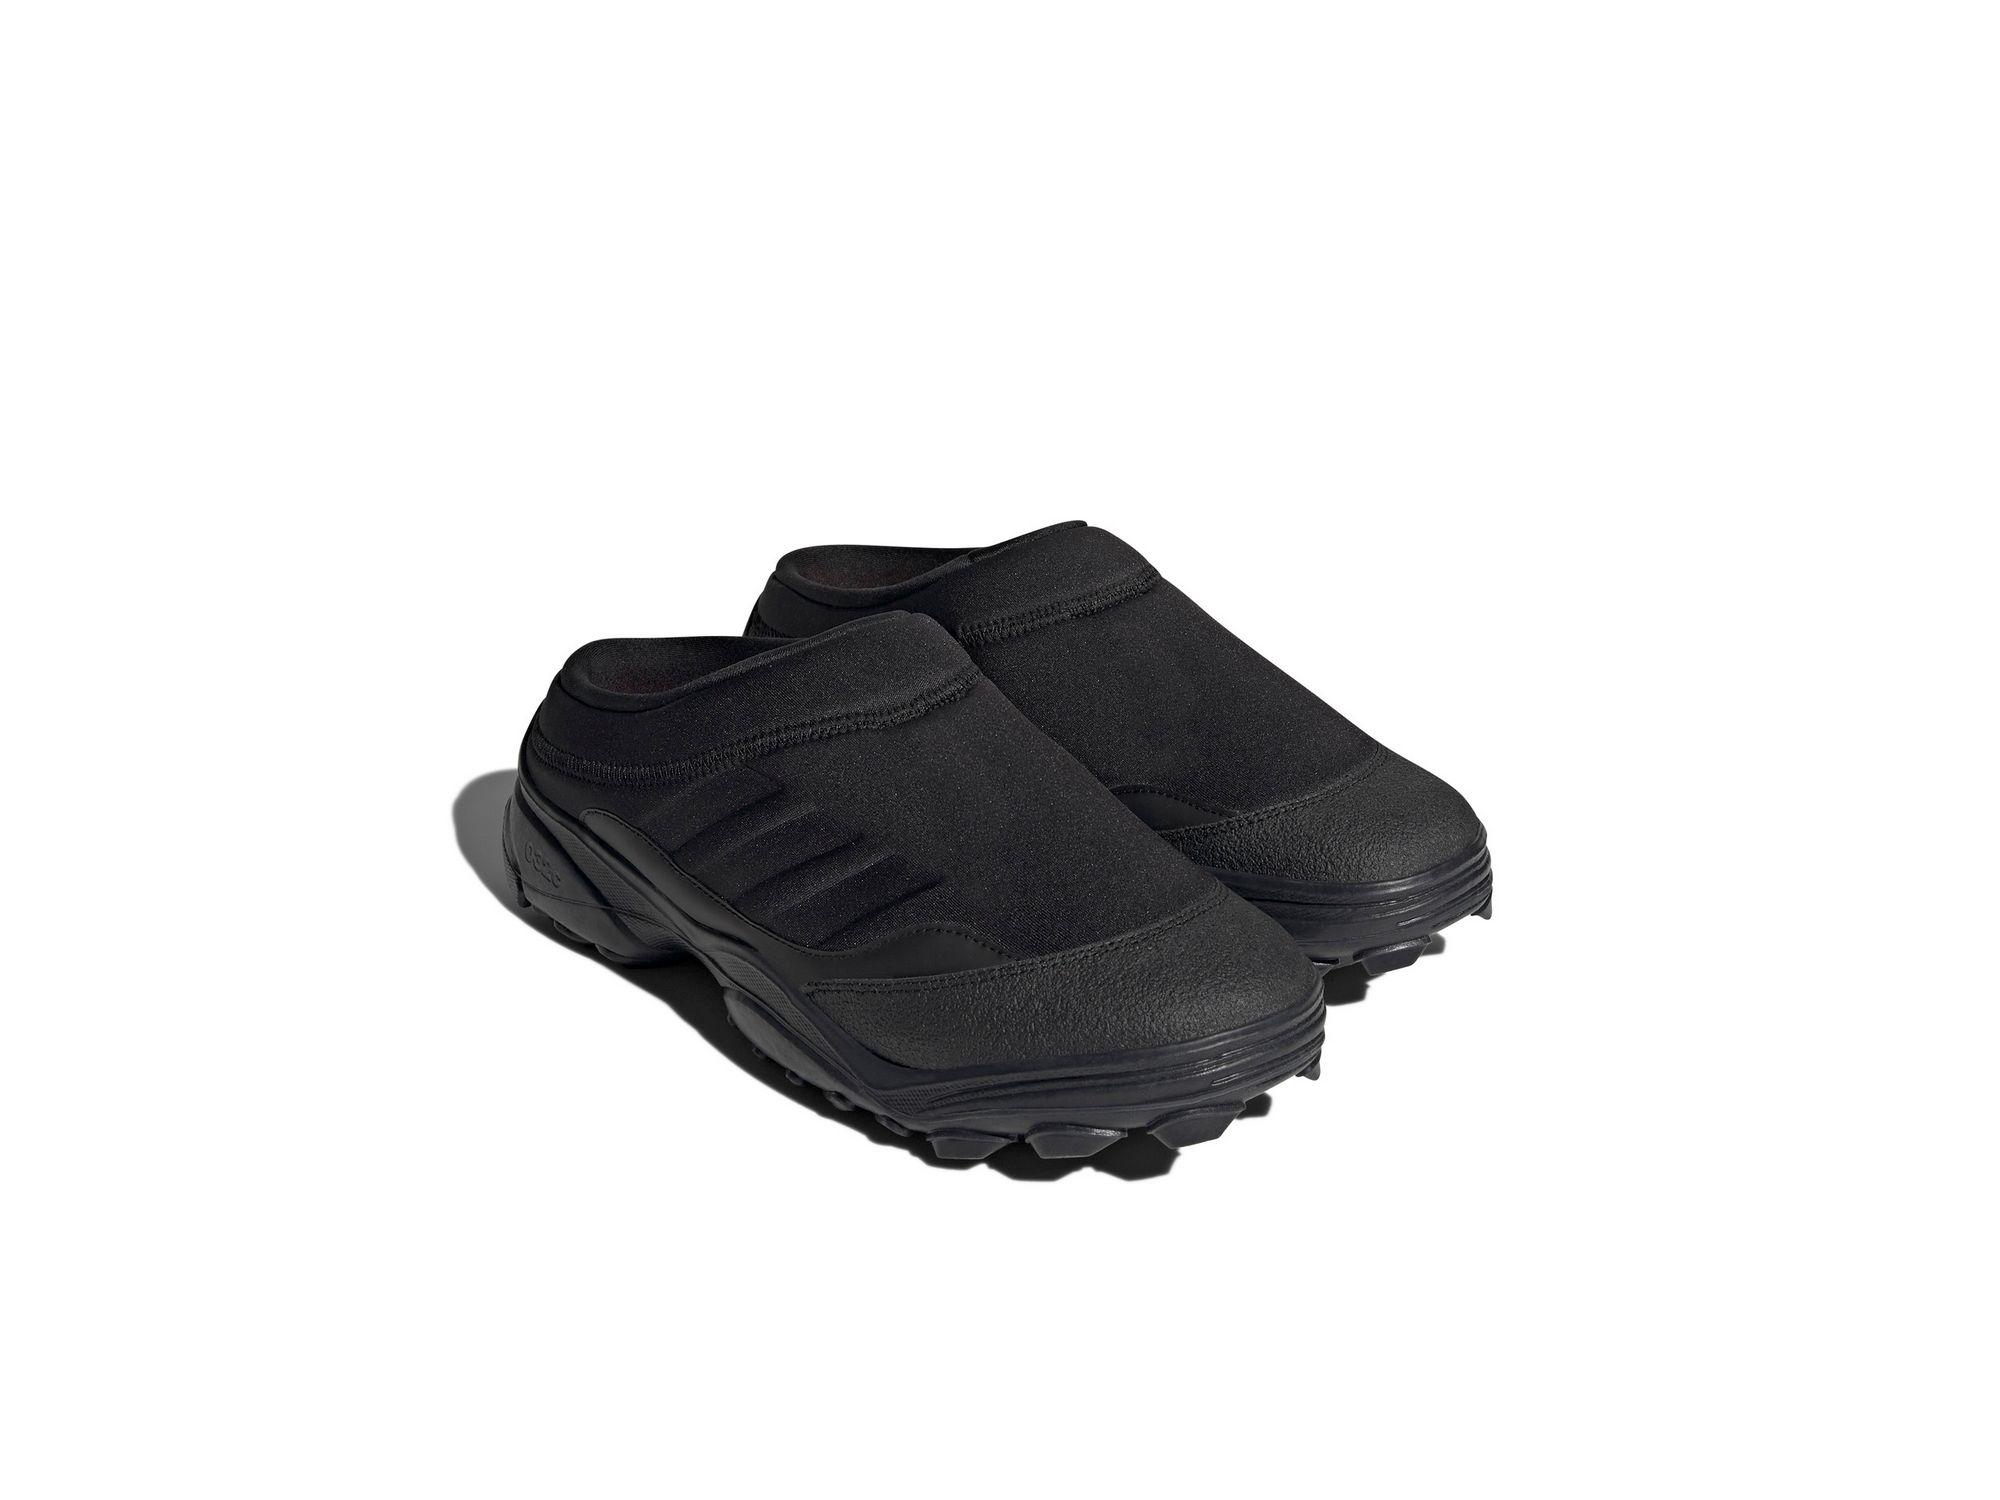 adidas x 032c GSG-9 Mule core black/core black/red - GZ5581